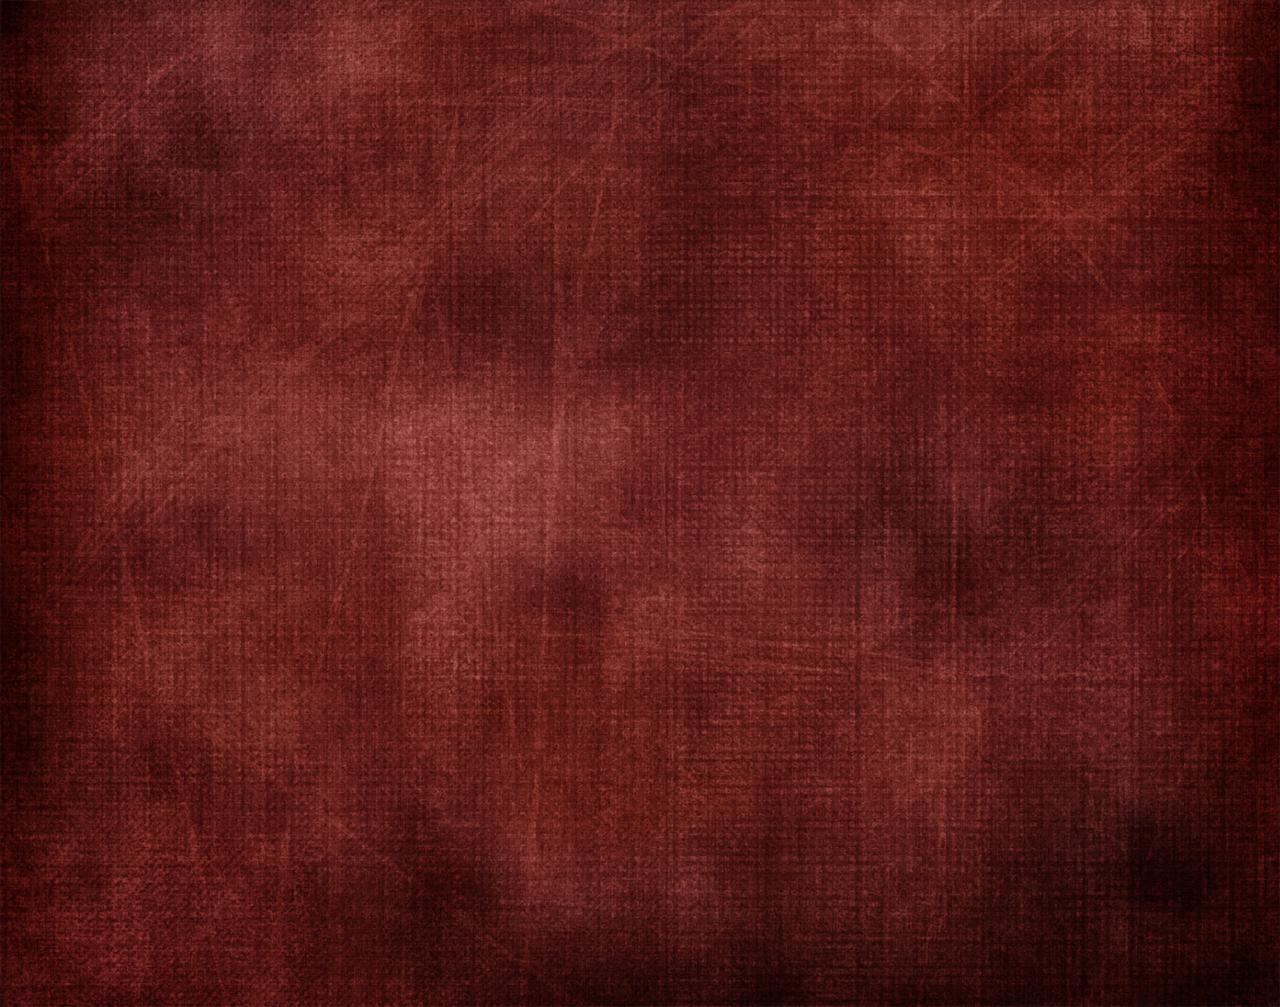 Burgundy Wallpaper 2017 Grasscloth Wallpaper HD Wallpapers Download Free Images Wallpaper [1000image.com]